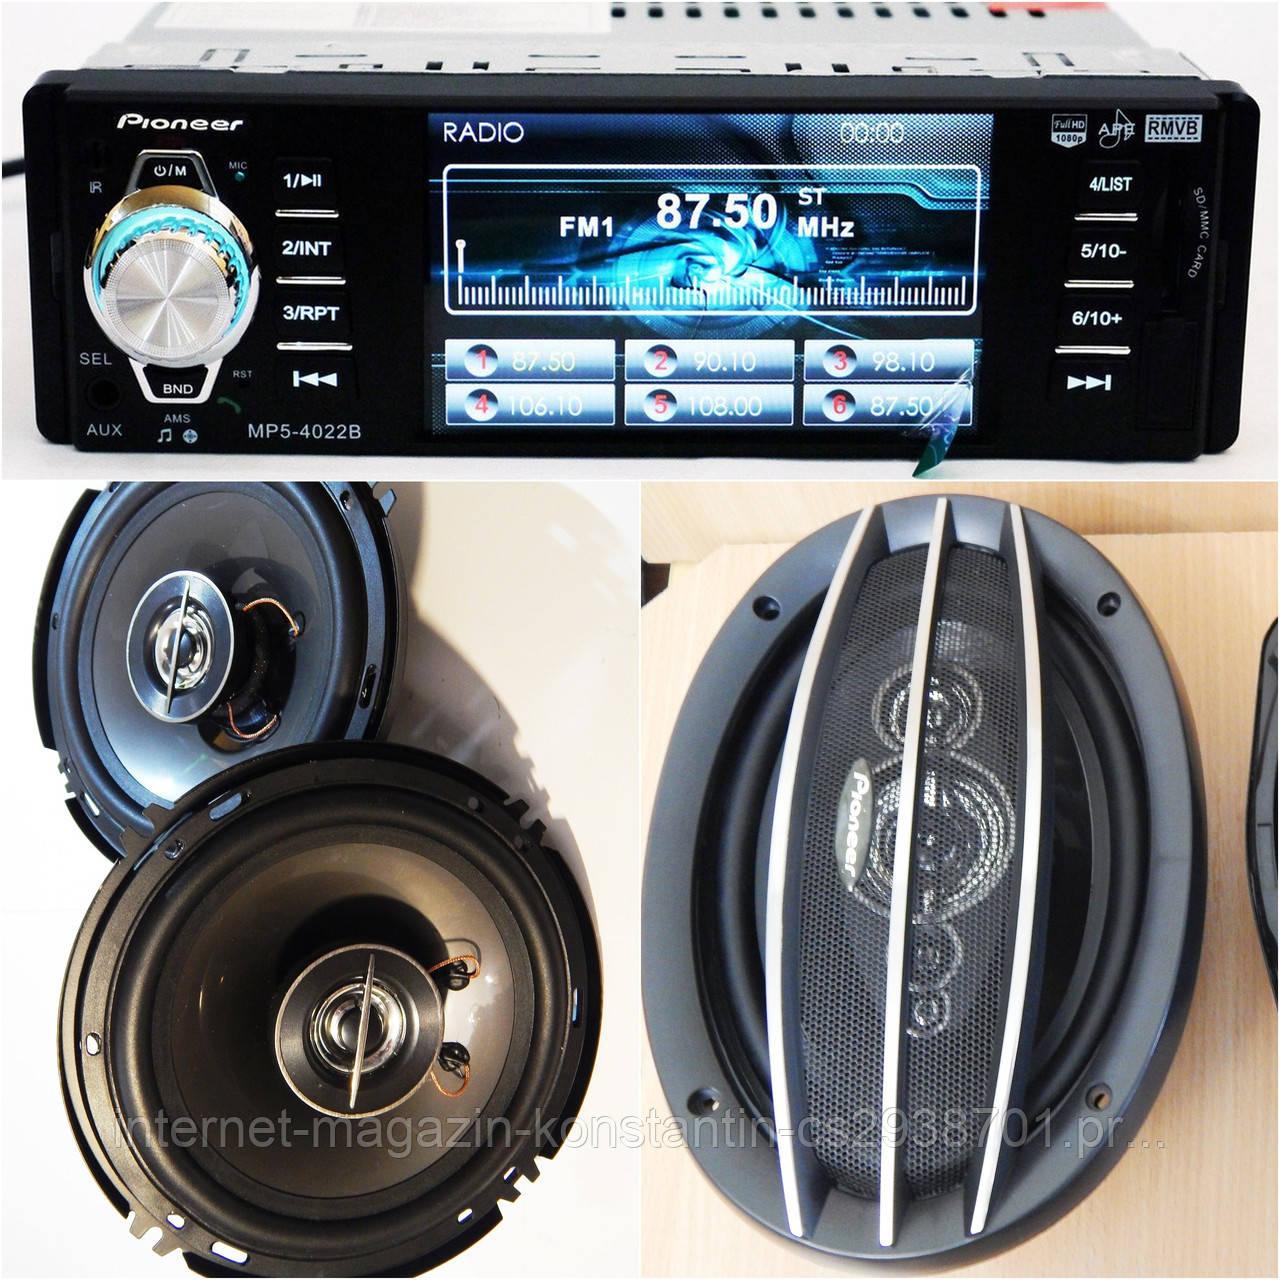 Набор Авто-звука с МР4 ВИДЕО Магнитолой Pioneer 4022B + Овалы 1000W + круглые 16 см 300W! НОВИНКА